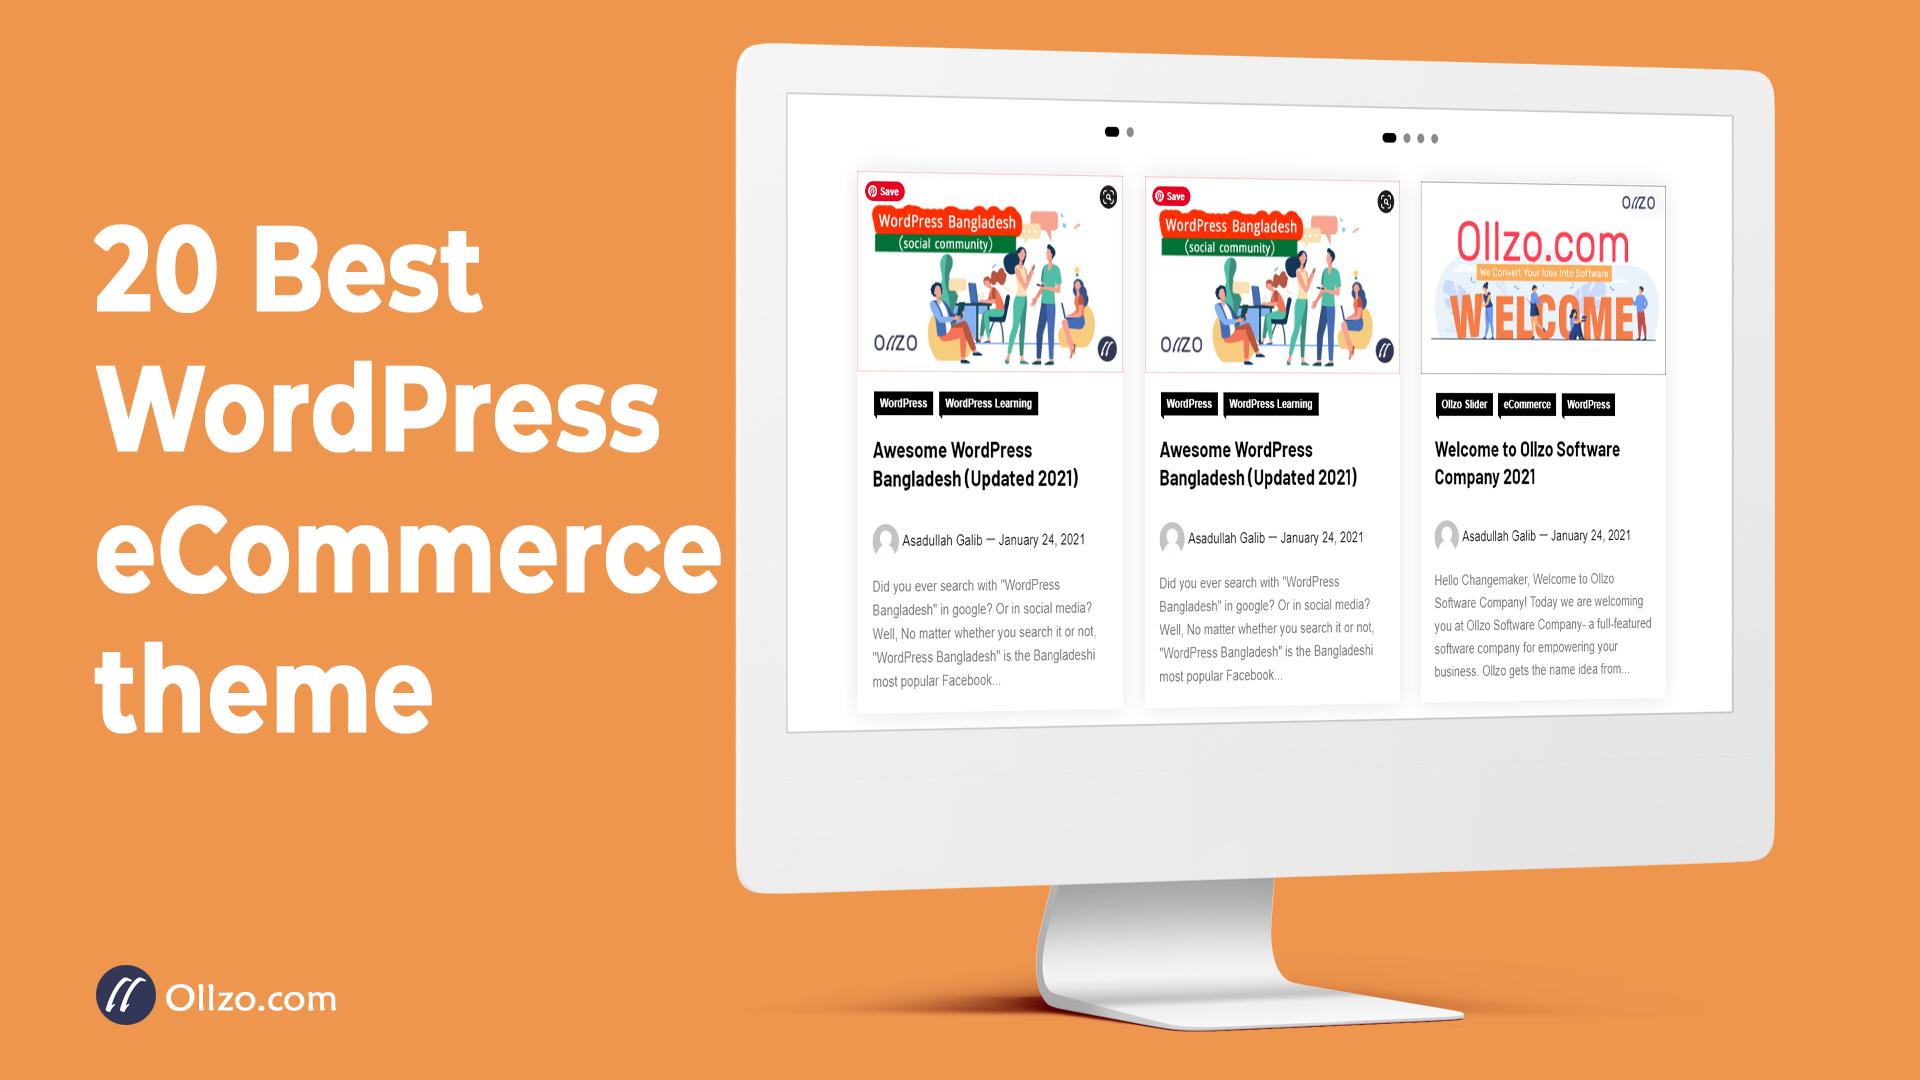 Best WordPress eCommerce theme, ollzo